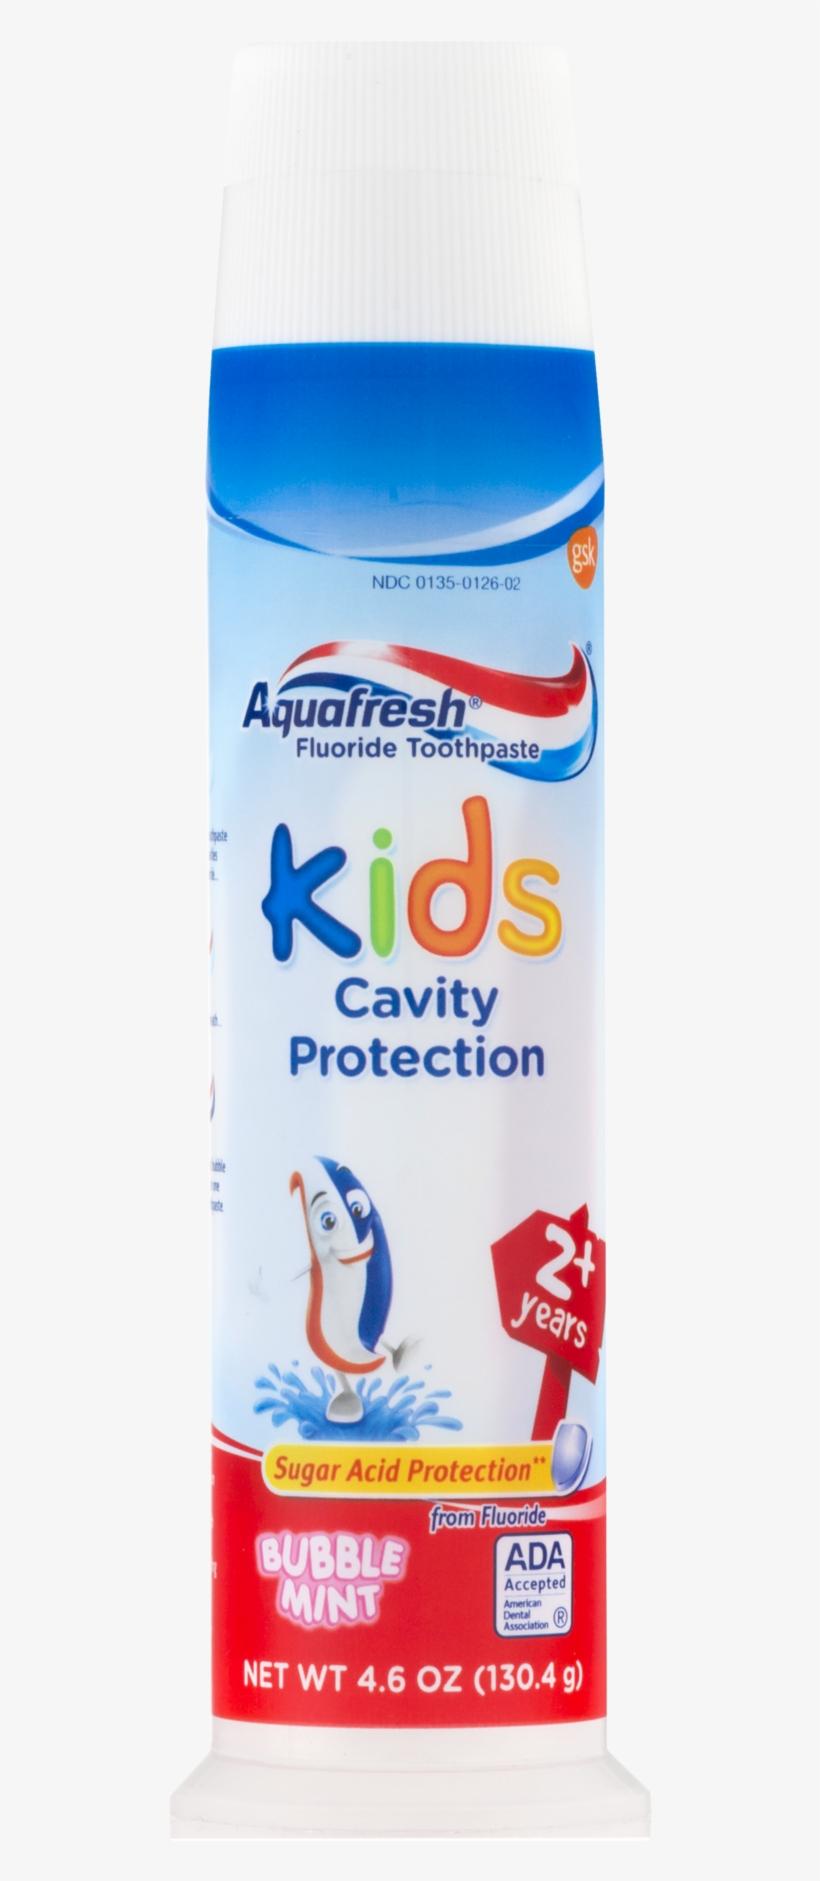 Aquafresh Fluoride Toothpaste Kids Cavity Protection - Fluoride Toothpaste Kids, transparent png #4185389